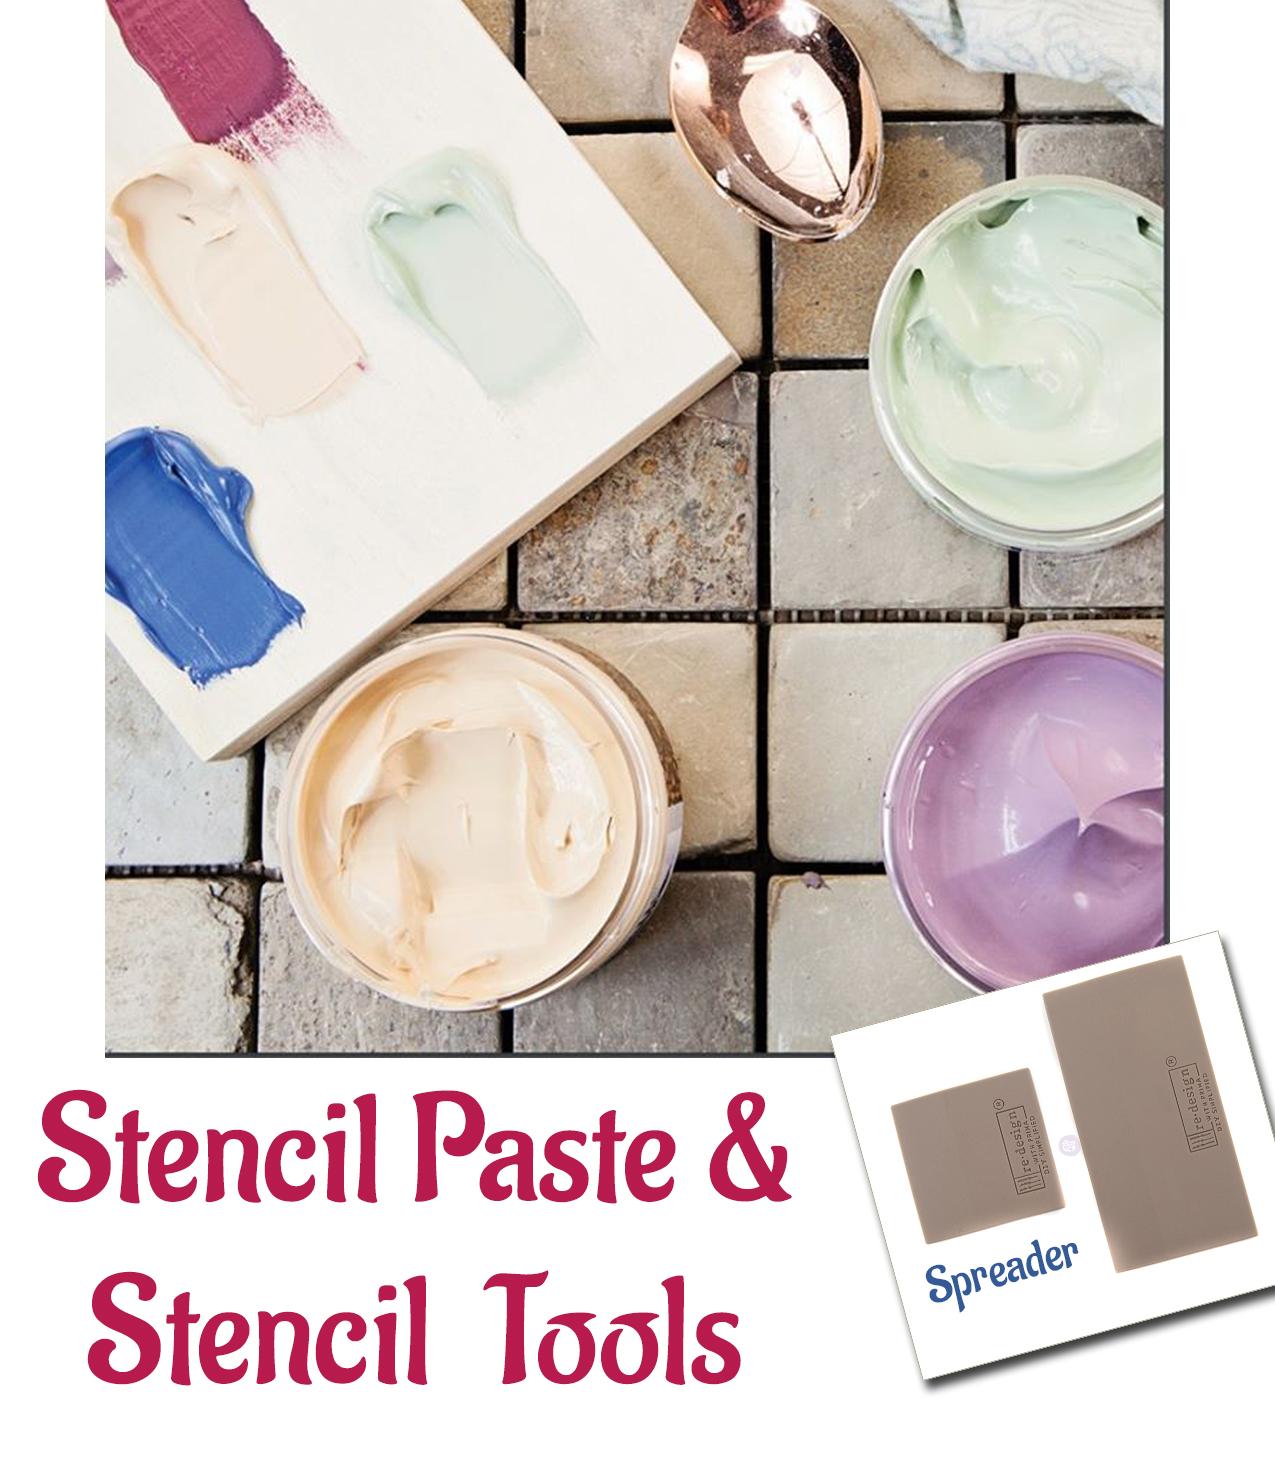 Stencil Paste & Tools